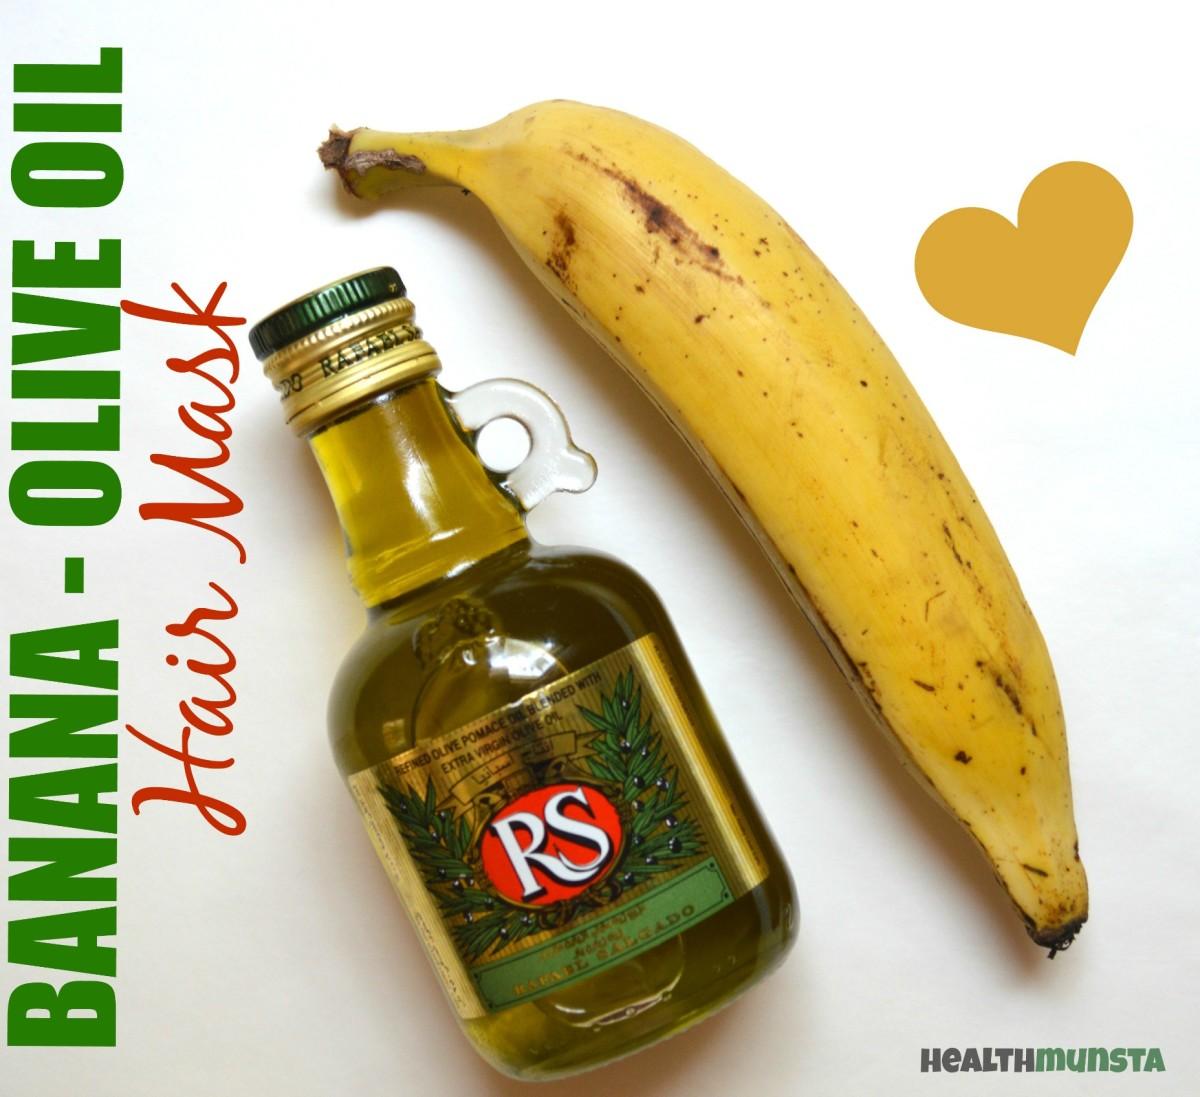 Recipe: Banana Olive Oil Mask for Damaged Hair